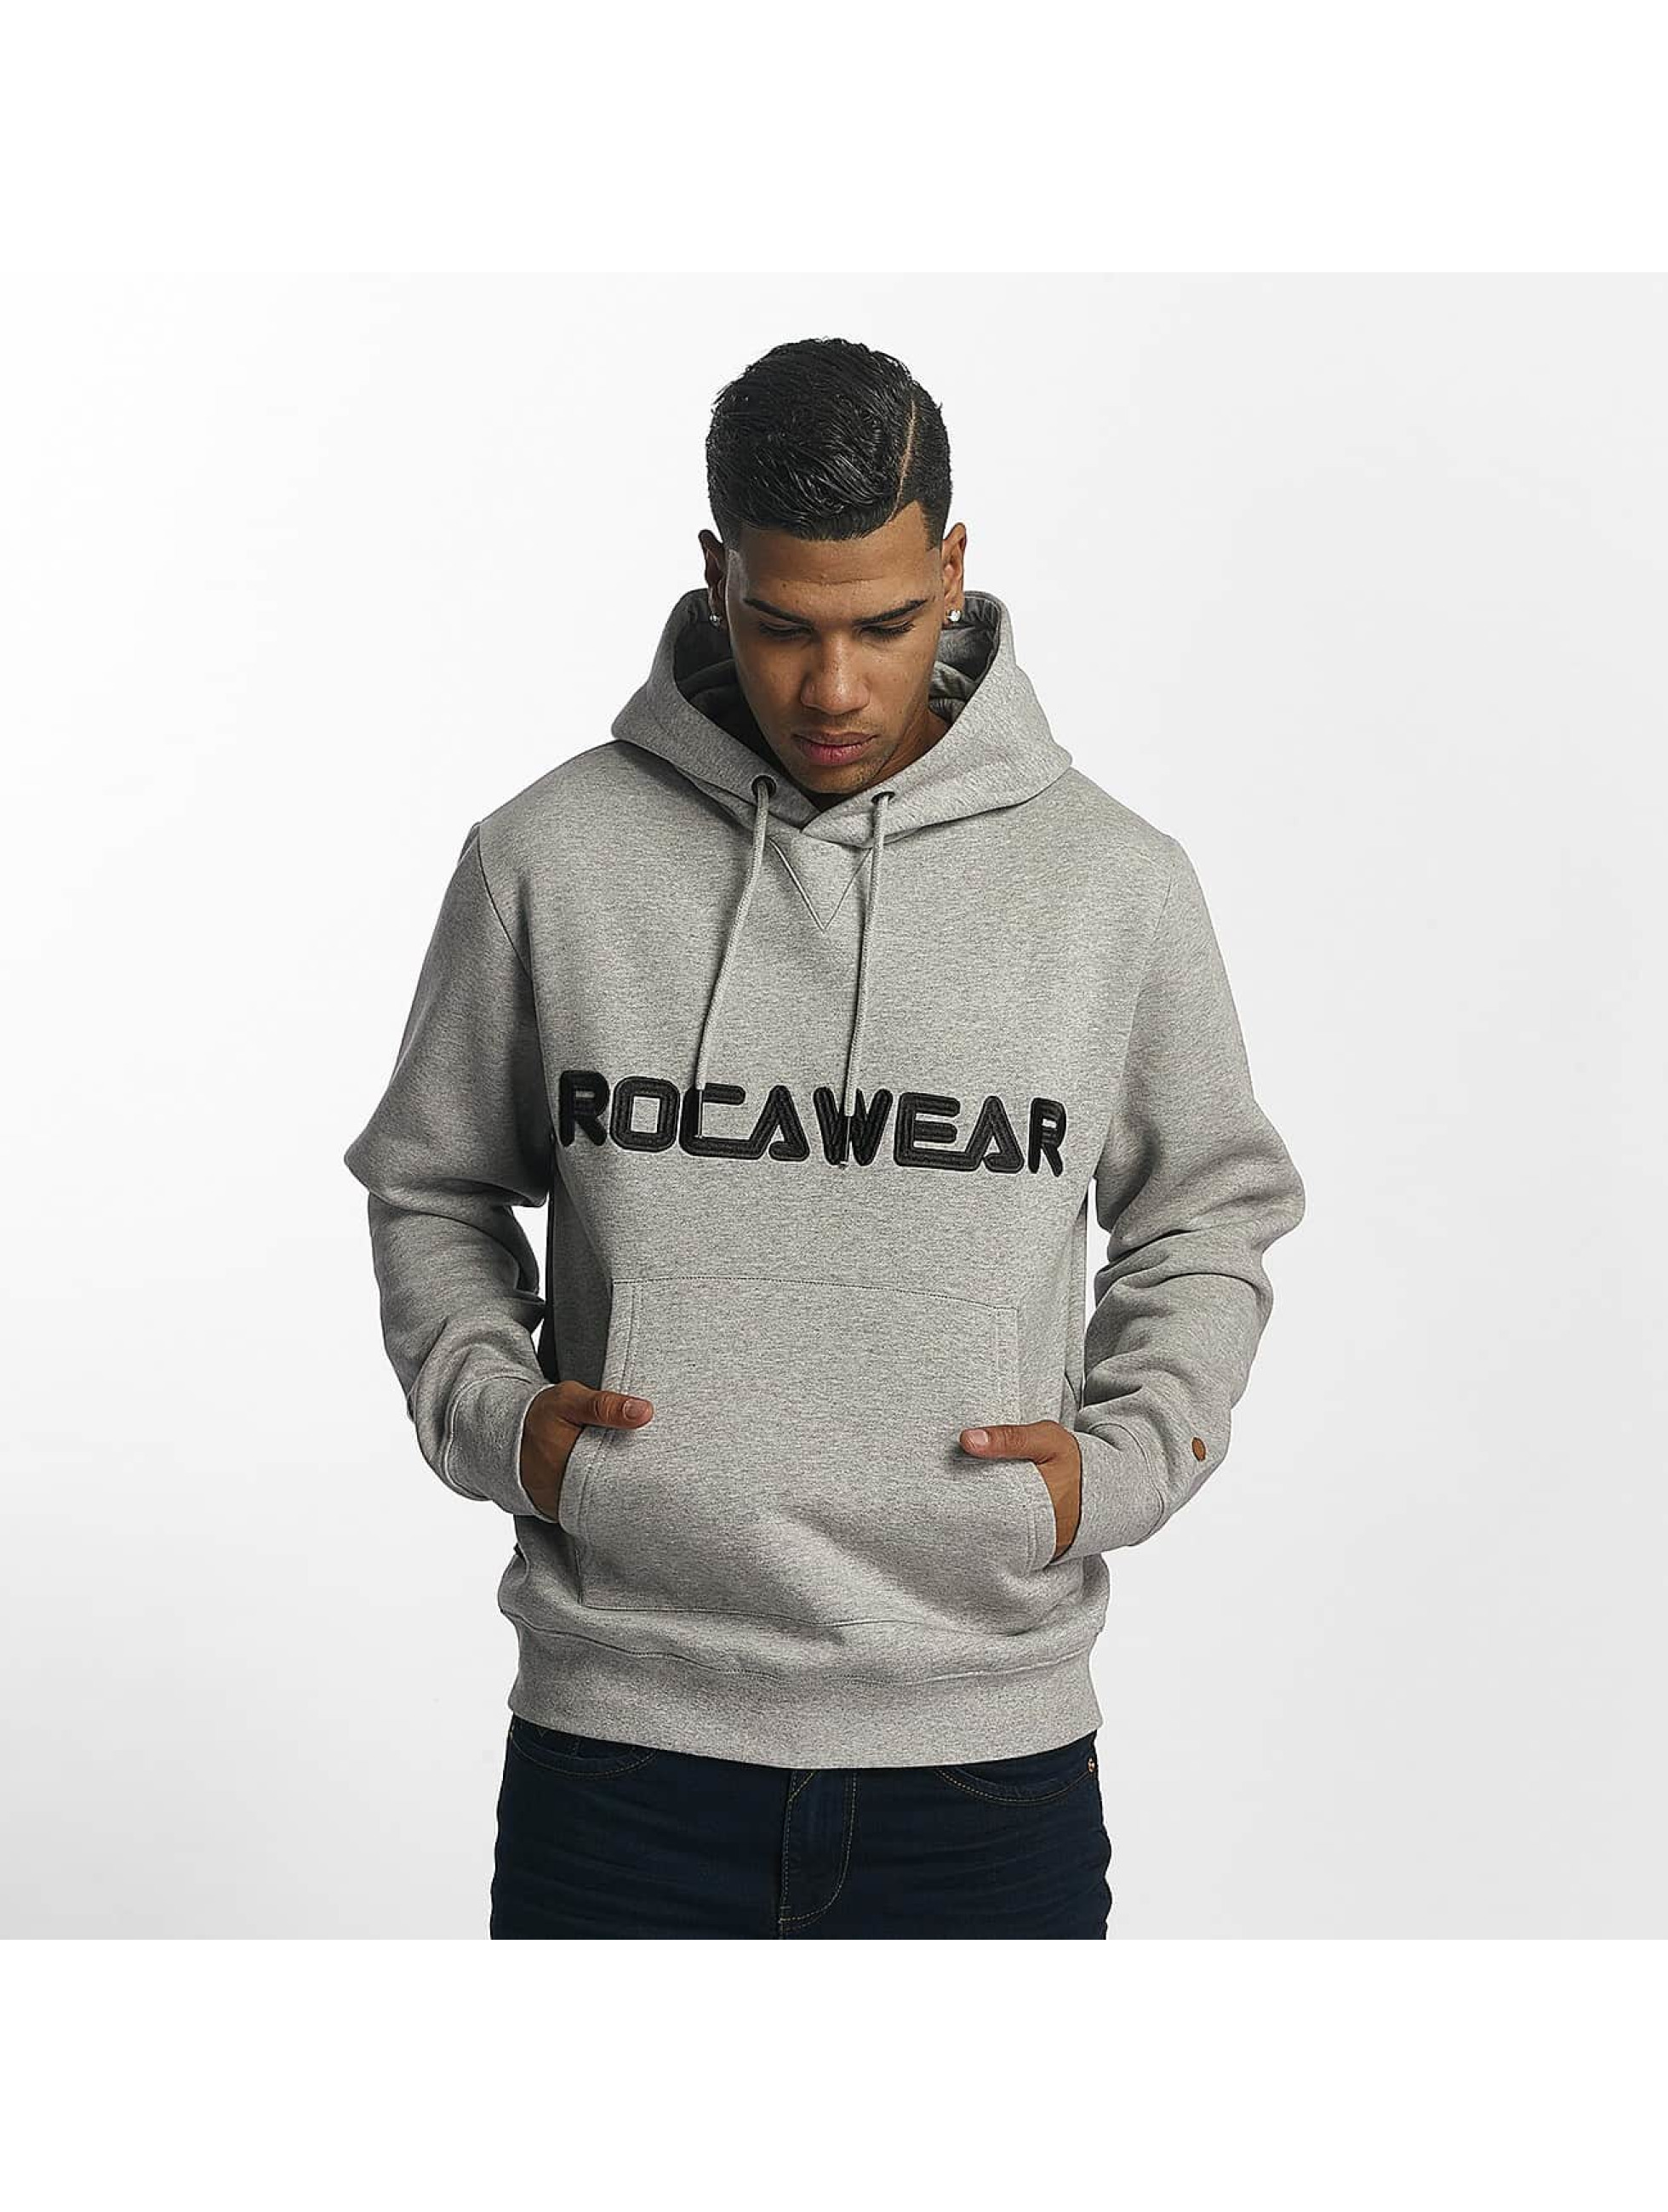 Rocawear / Hoodie Font in grey S